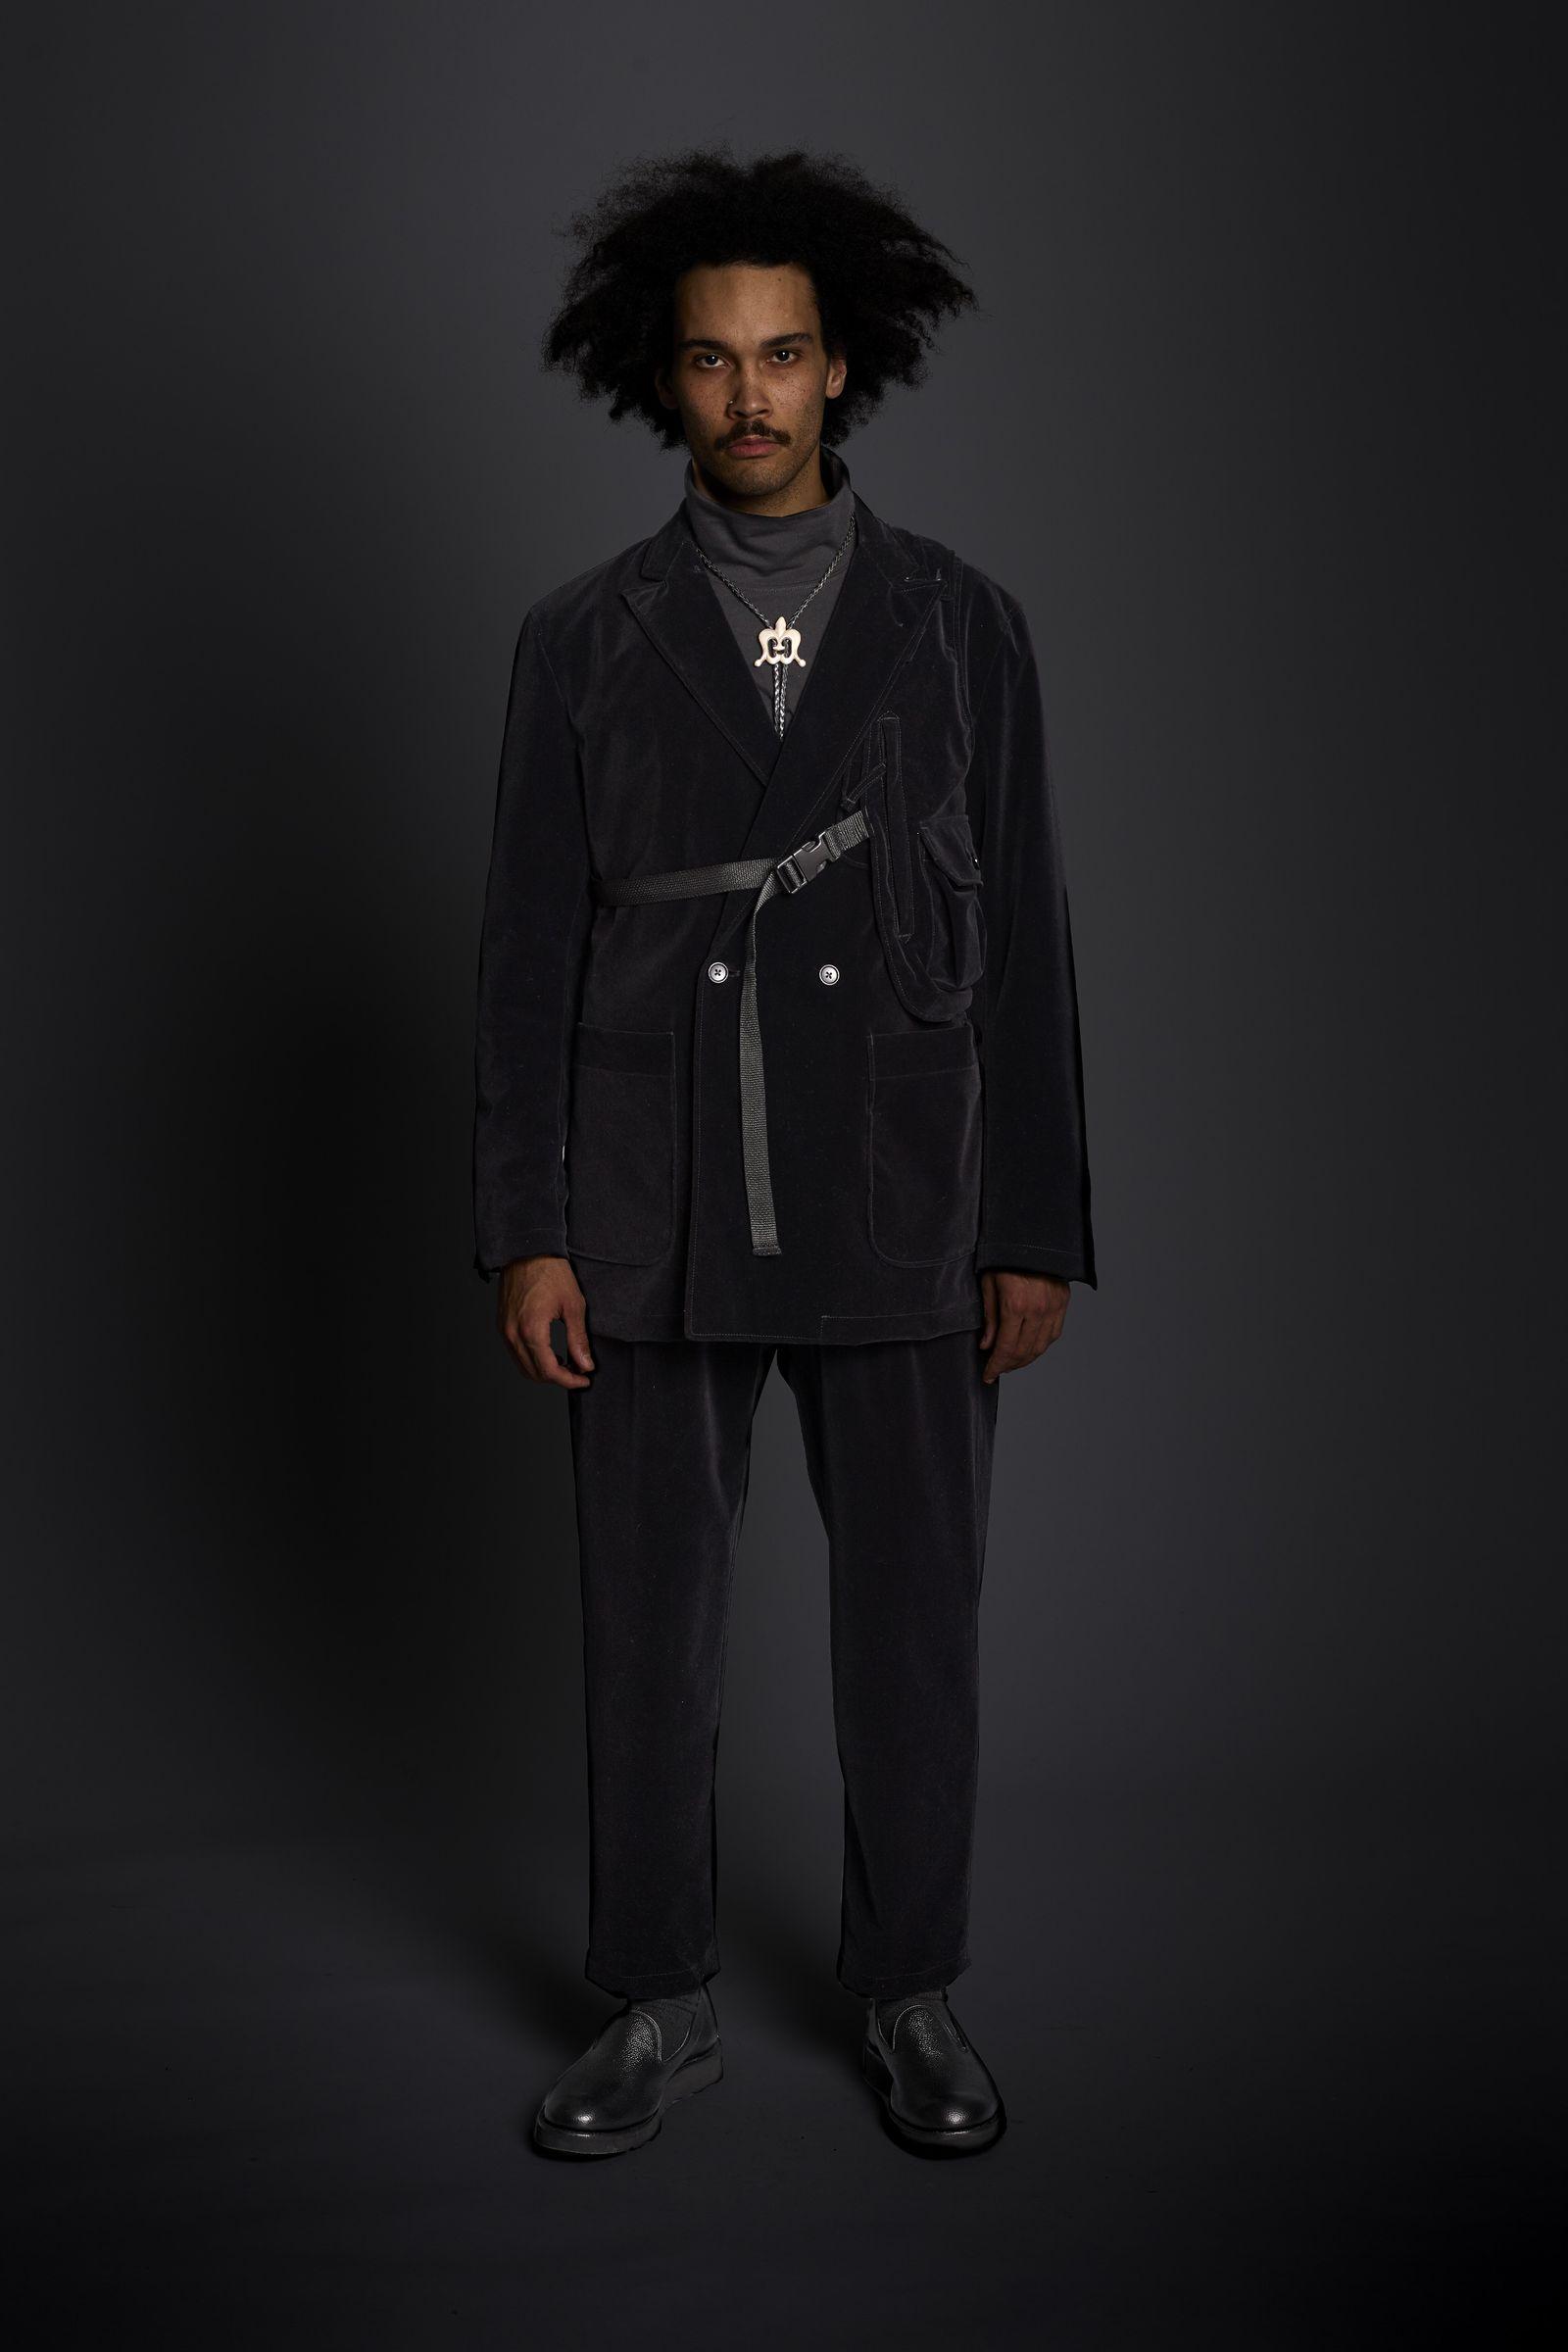 engineered-garments-fall-winter-2020-41